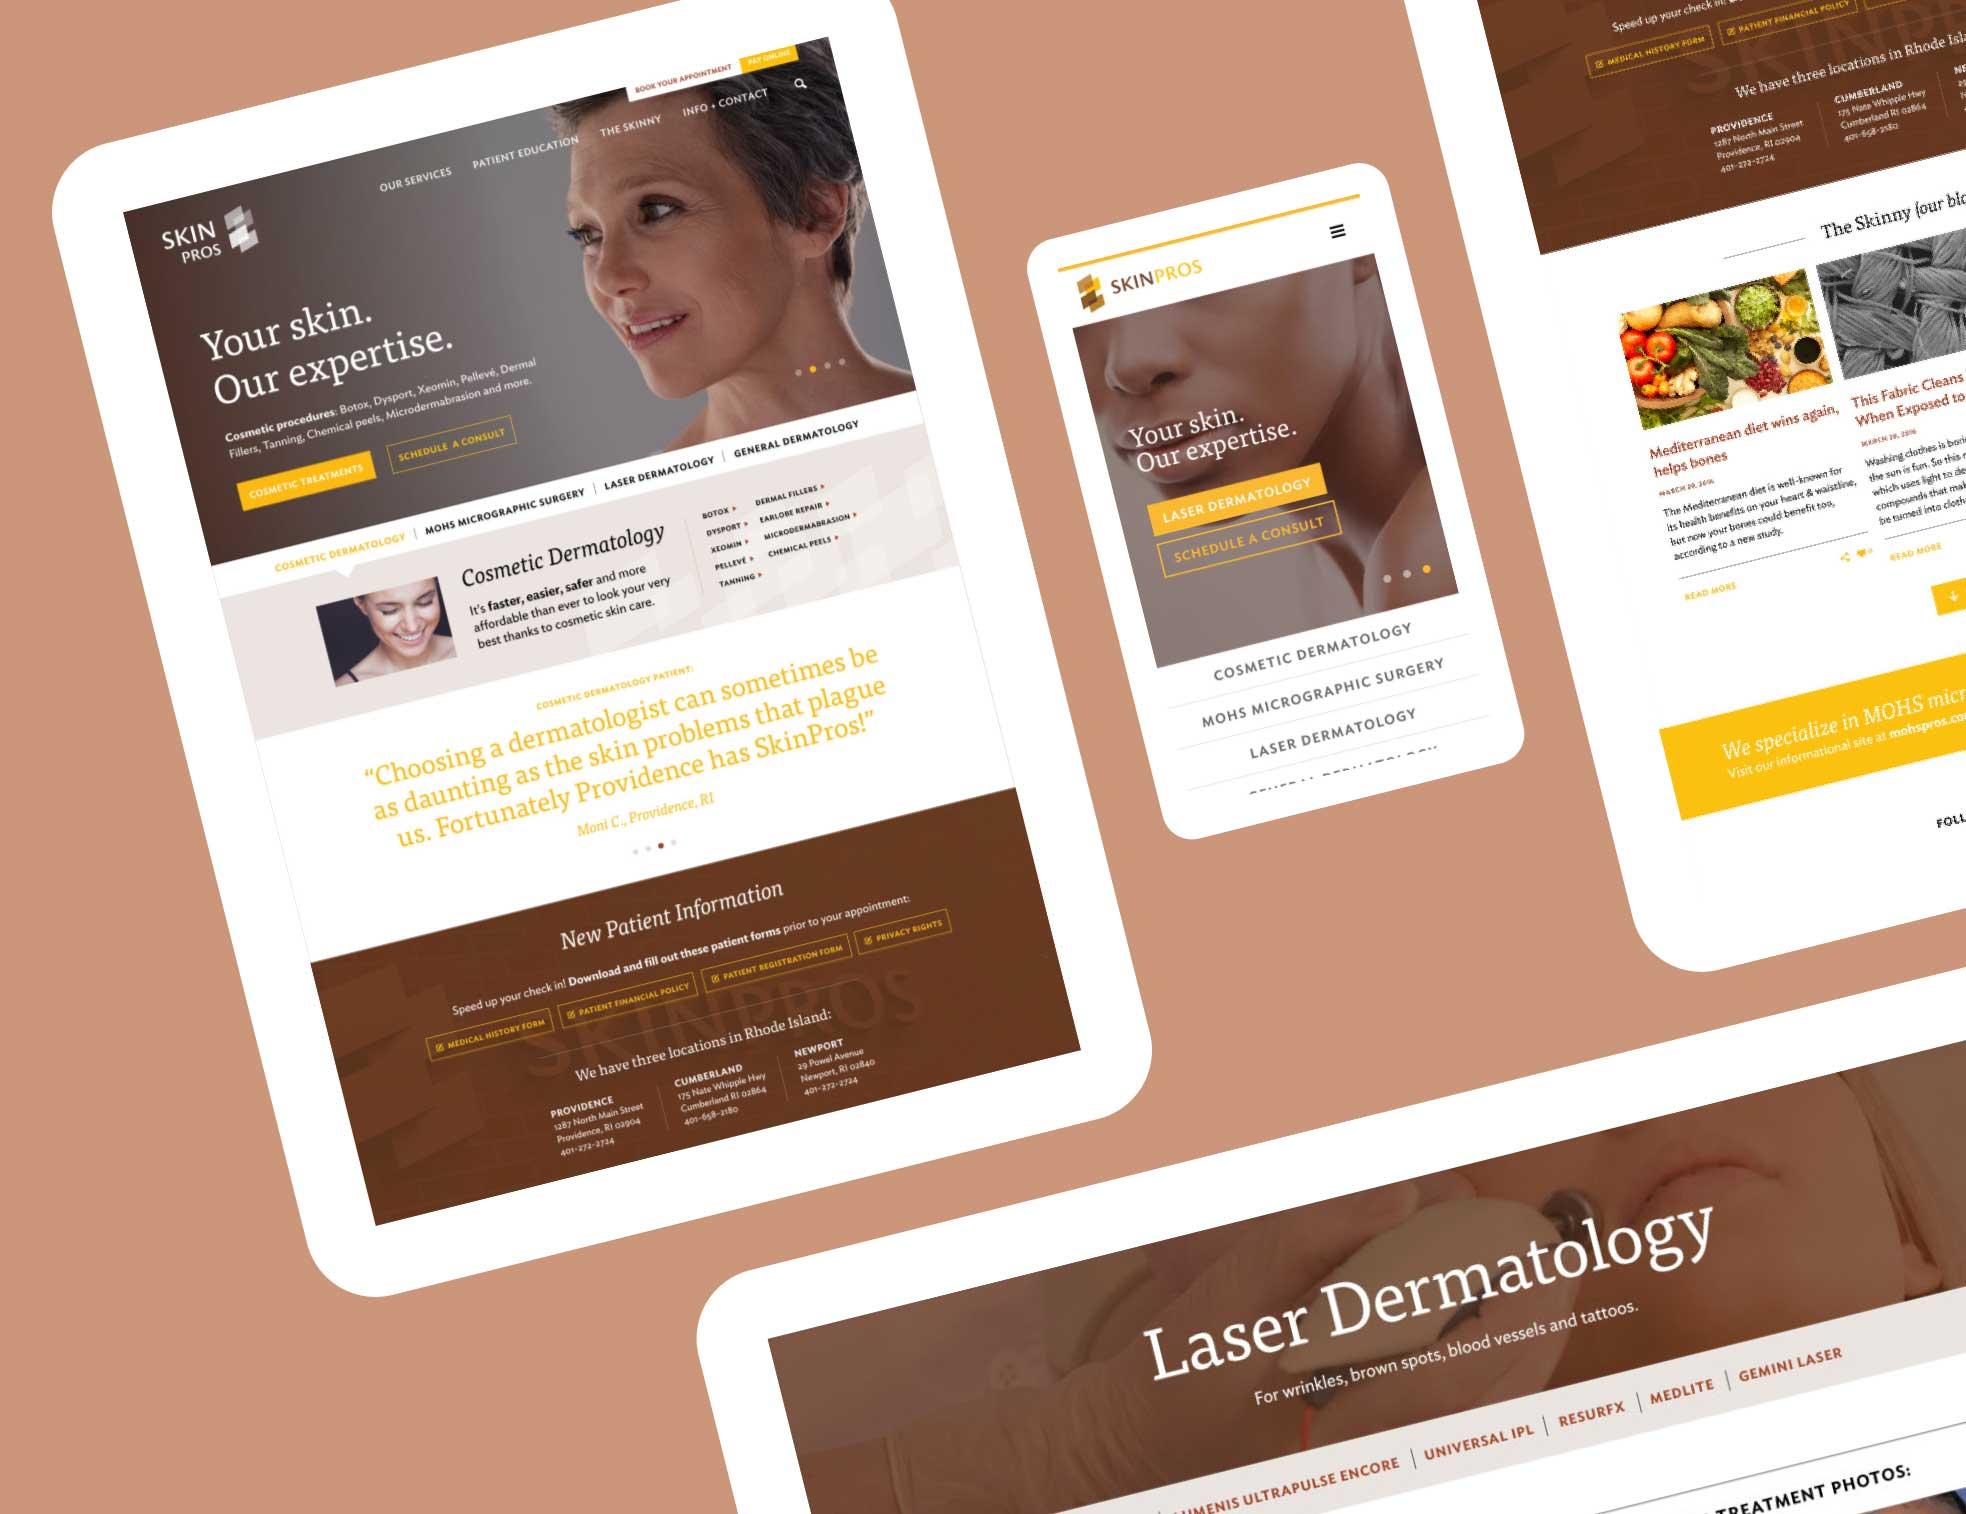 SkinPros web design and development